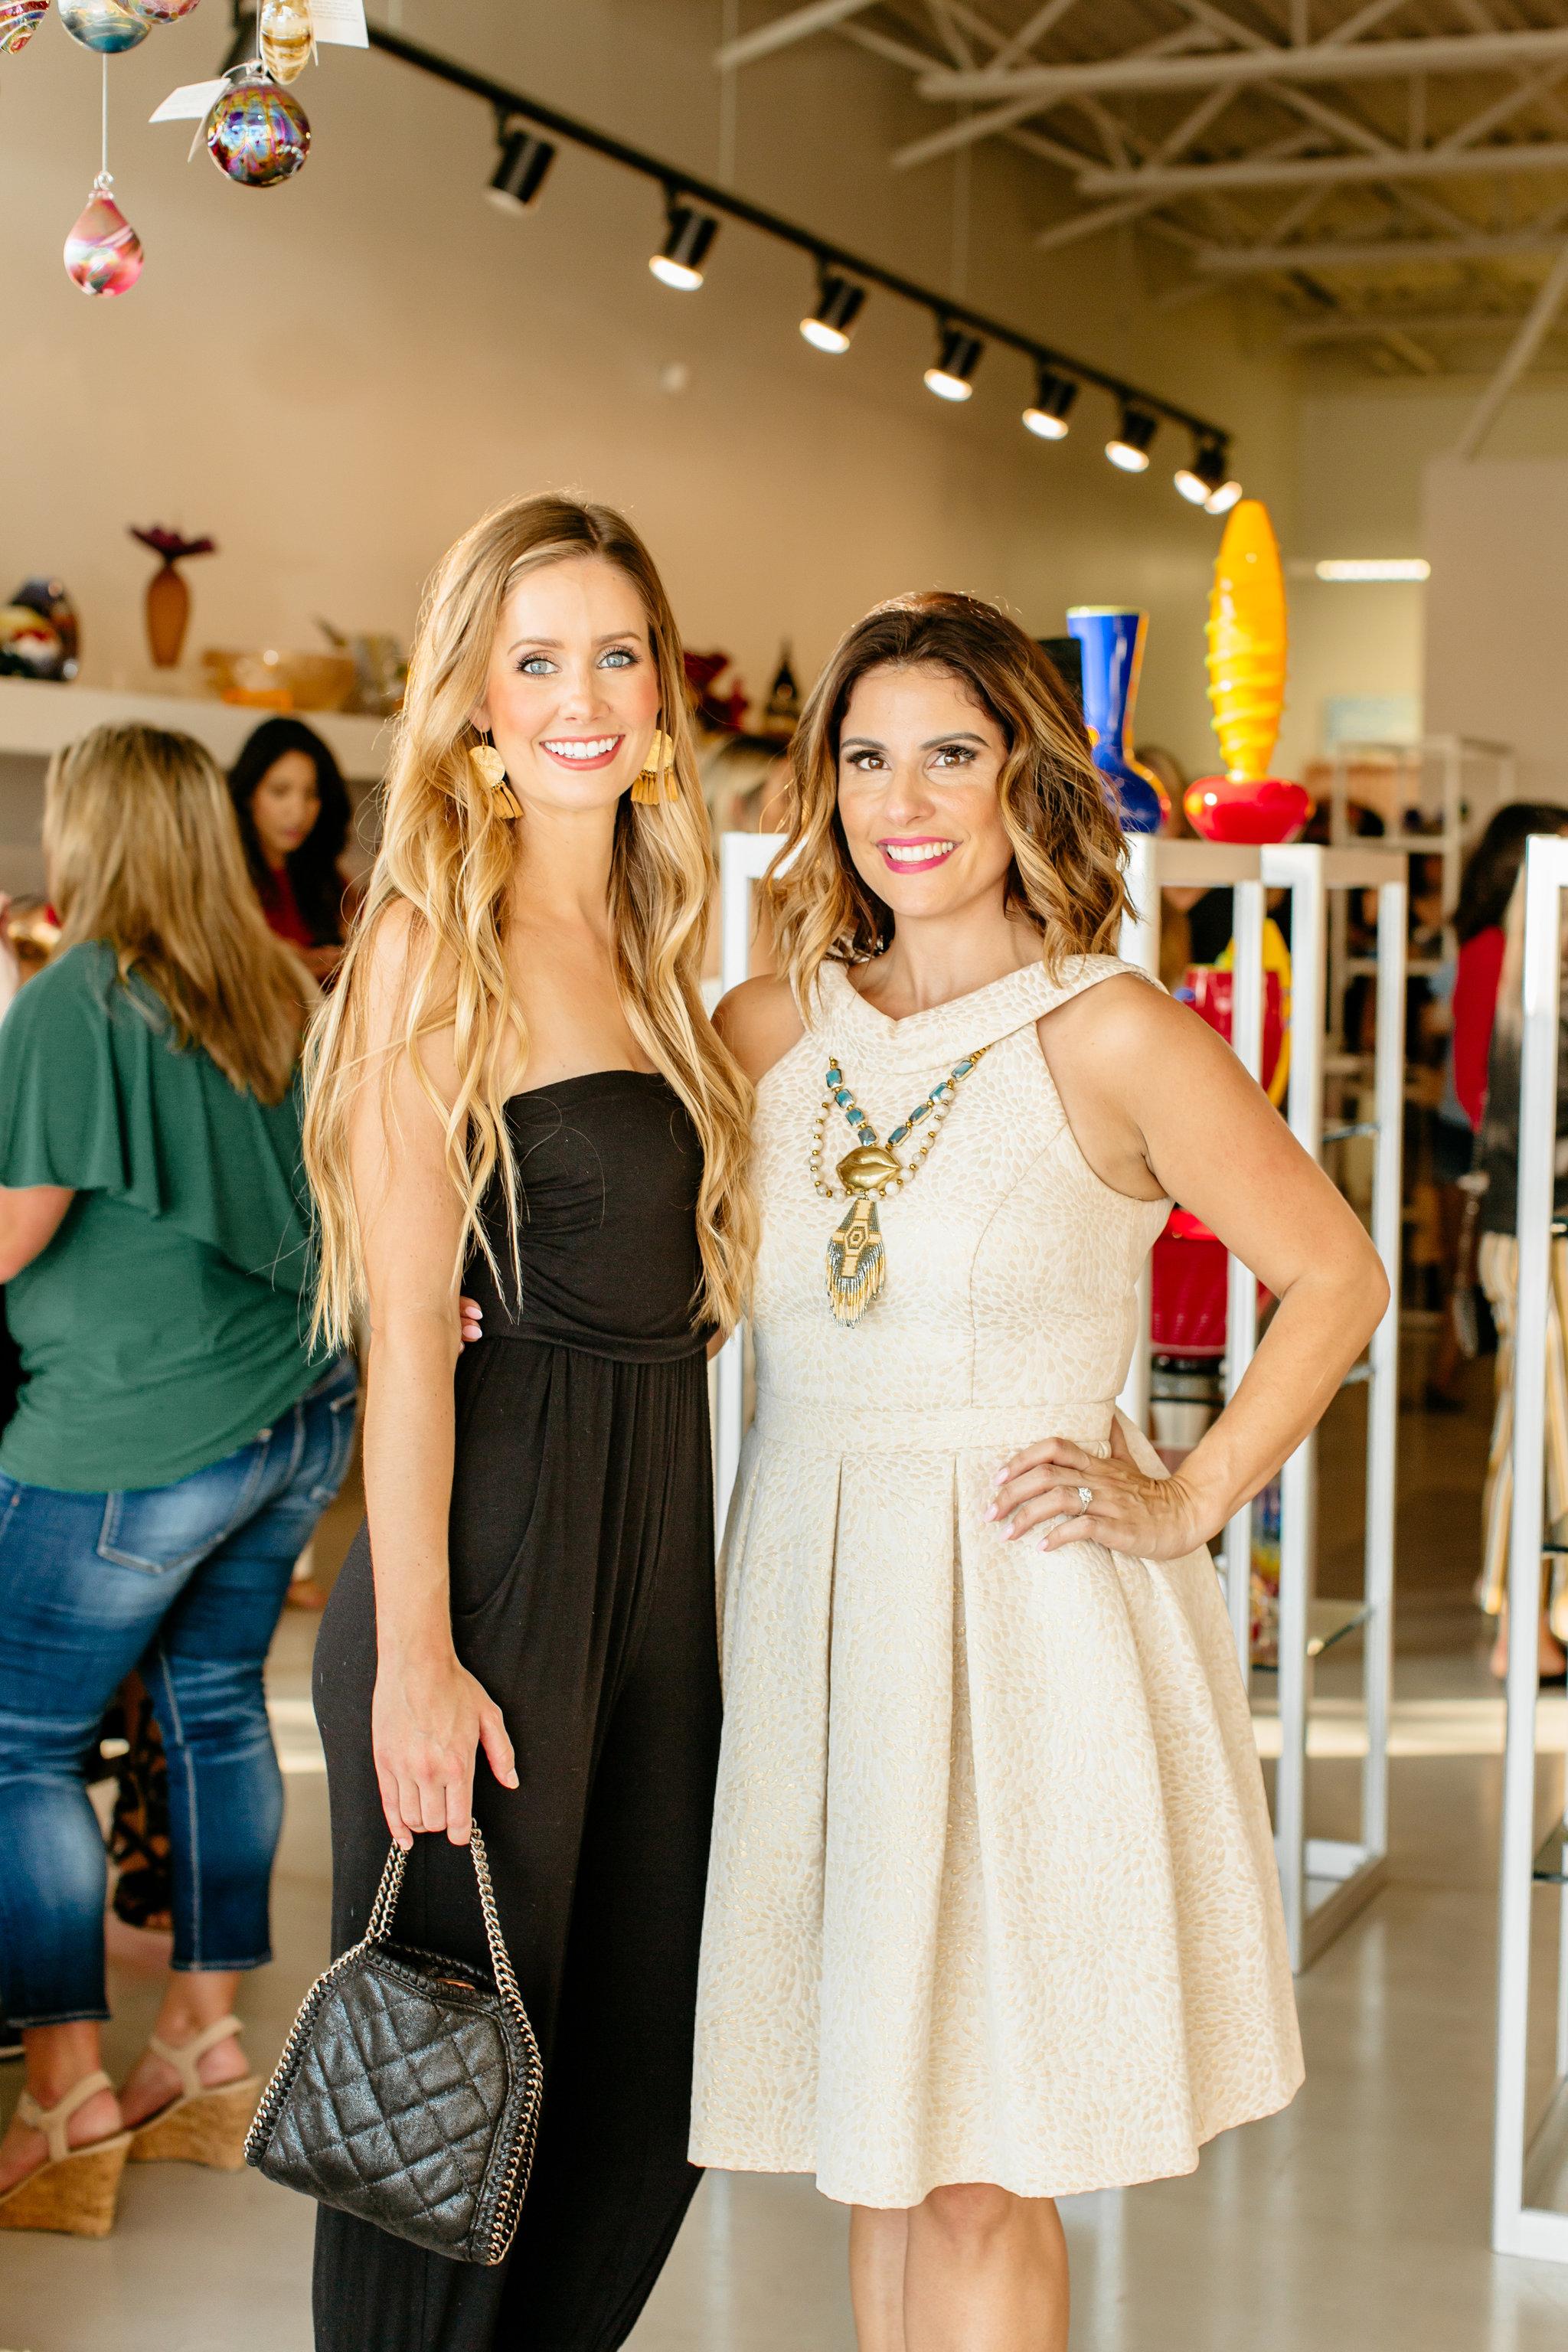 Alexa-Vossler-Photo_Dallas-Event-Photographer_Brite-Bar-Beauty-2018-Lipstick-Launch-Party-136.jpg